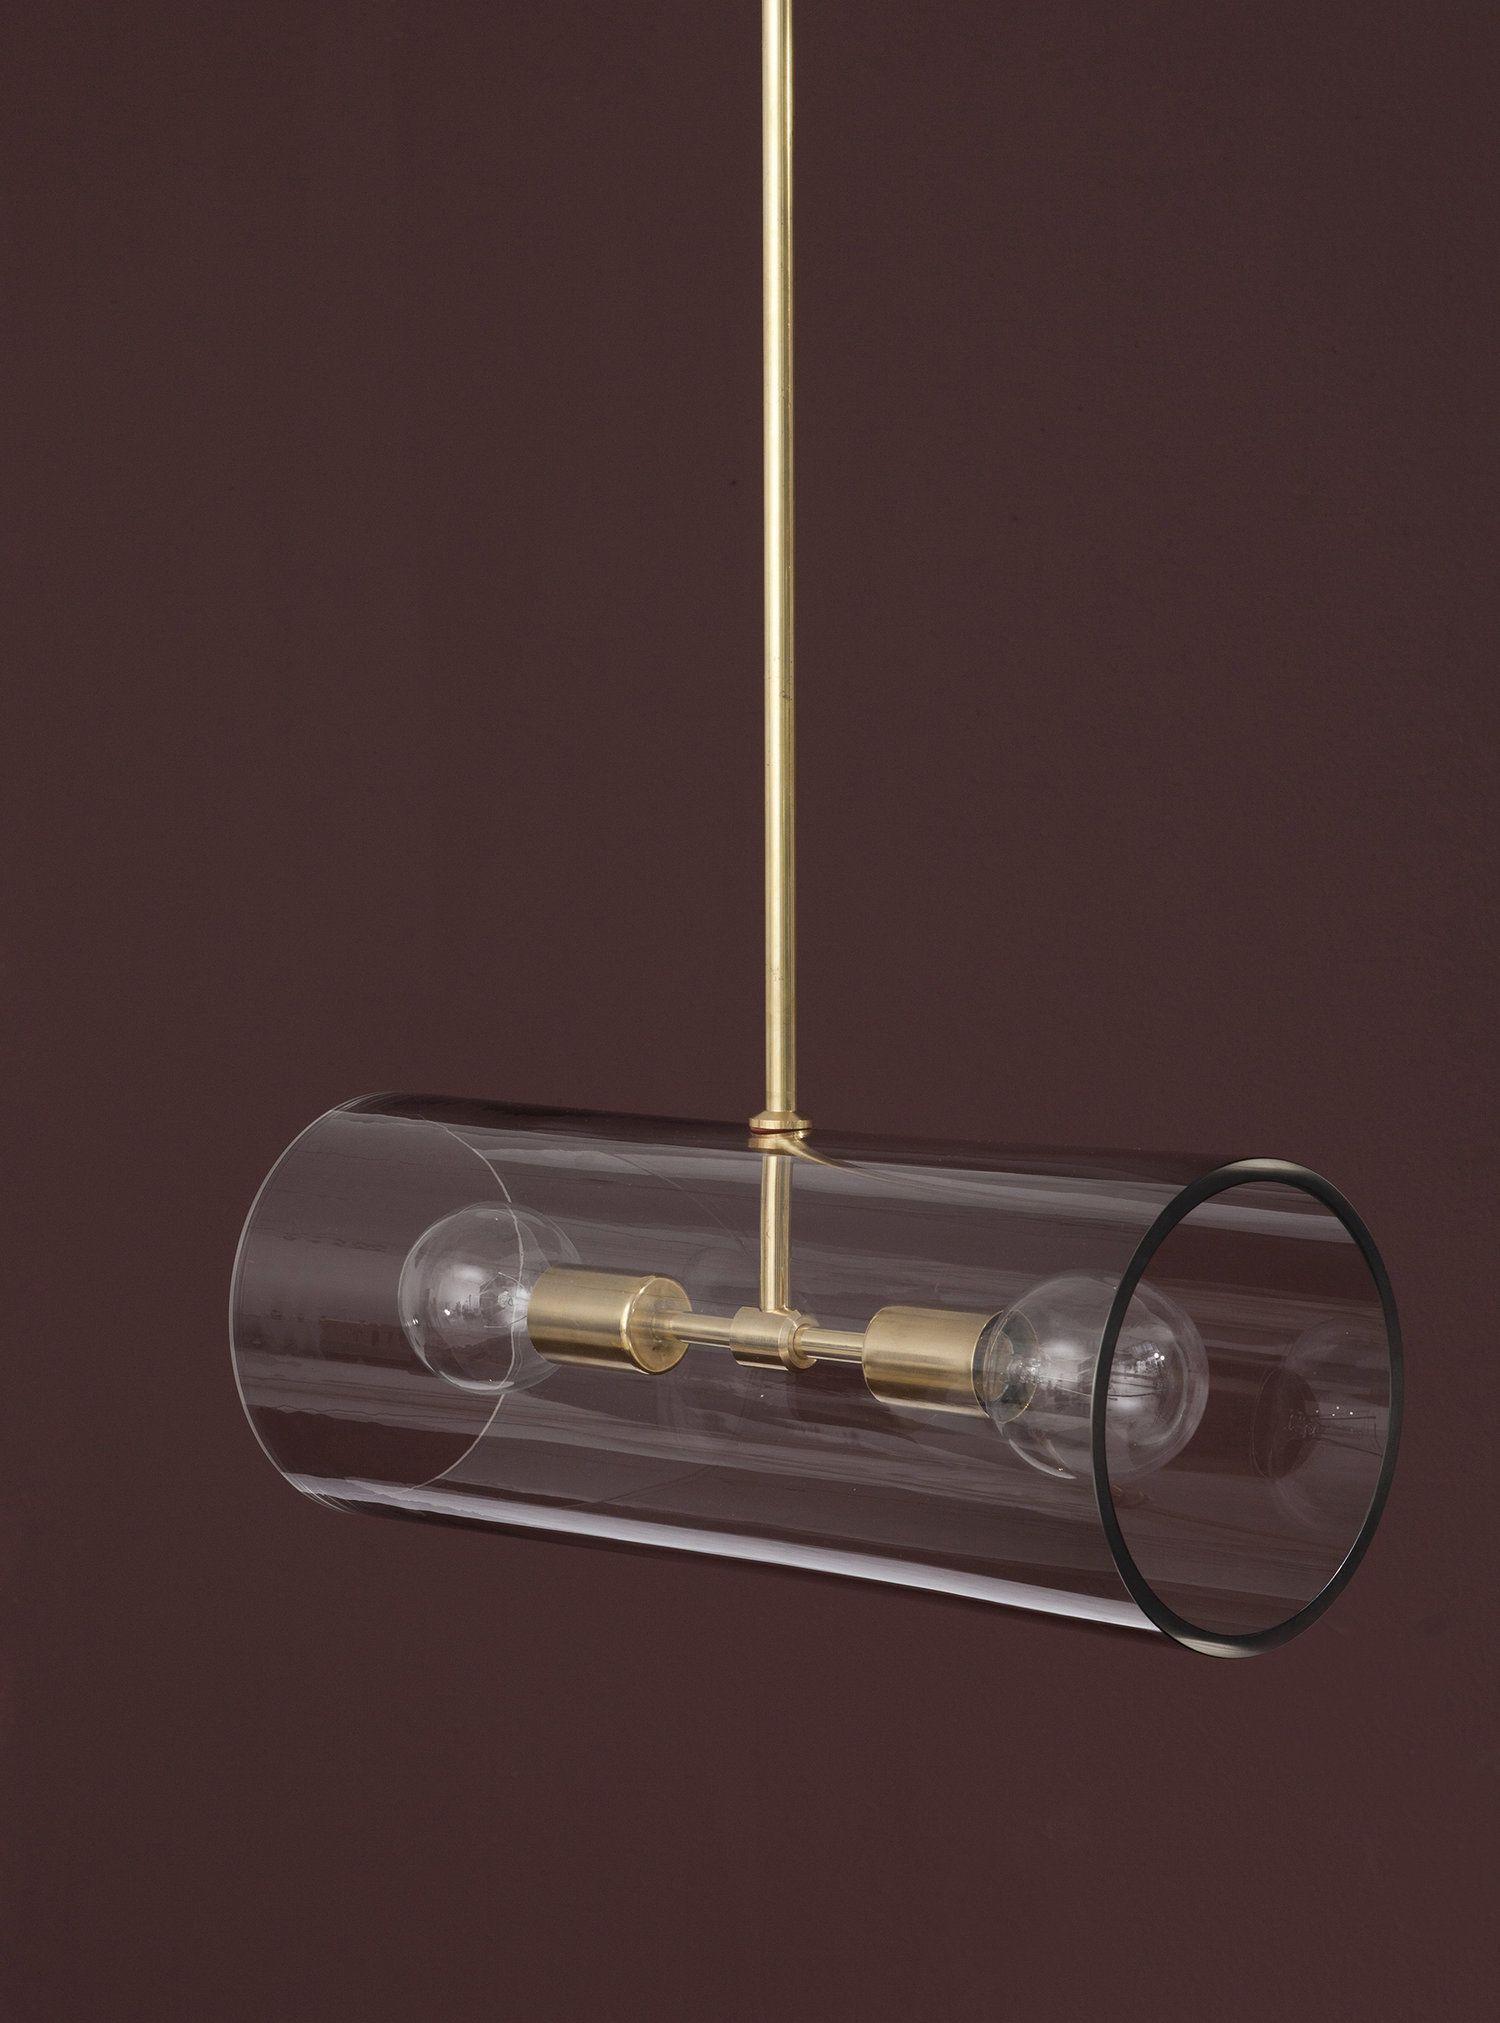 Nunki No 1 1 Lighting Inspiration Lamp Light Fittings